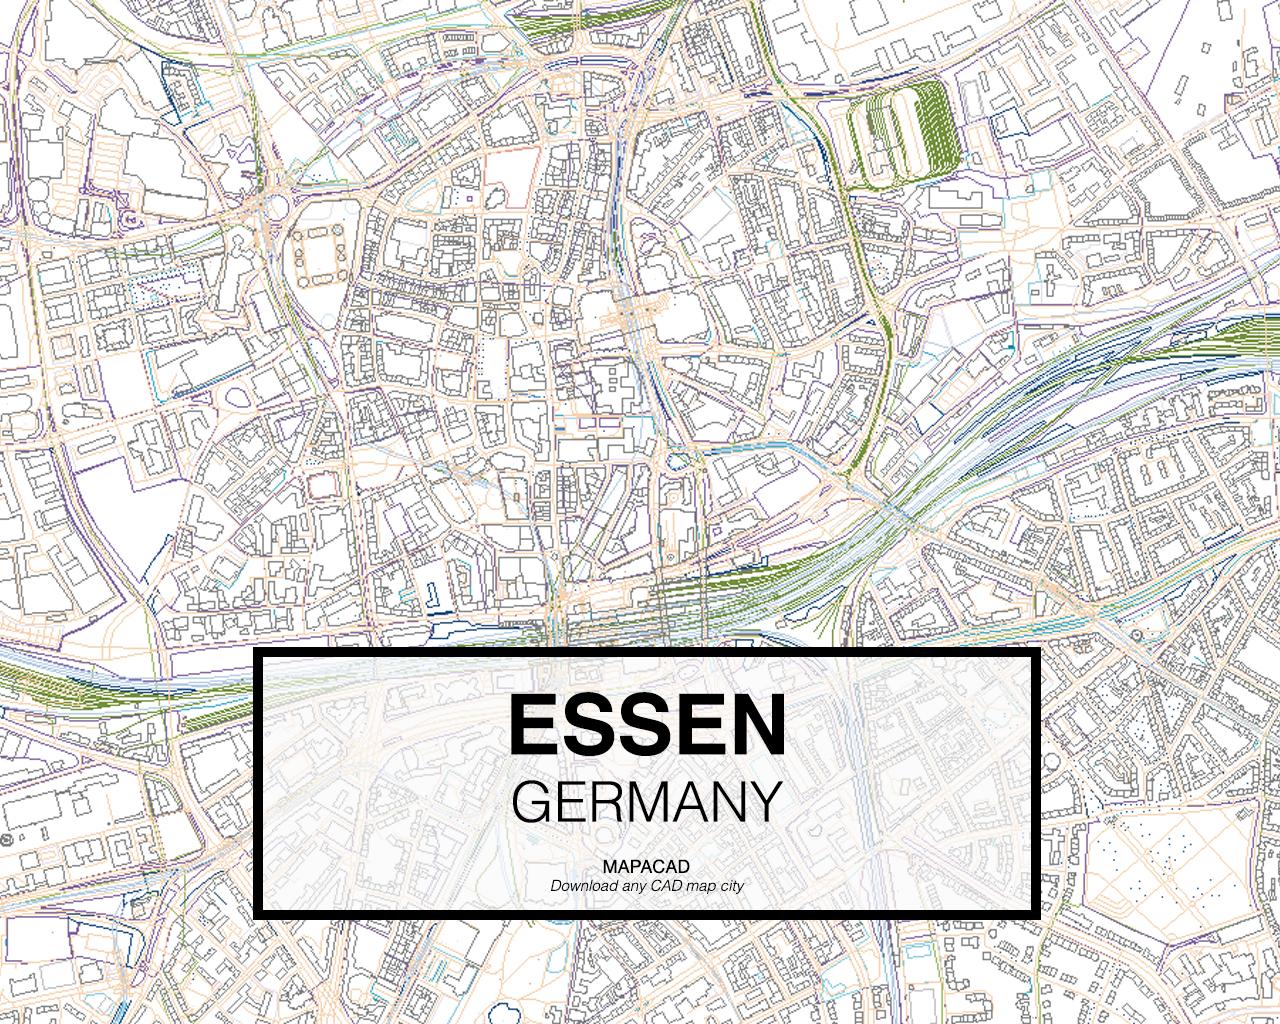 Map Of Germany Essen.Essen